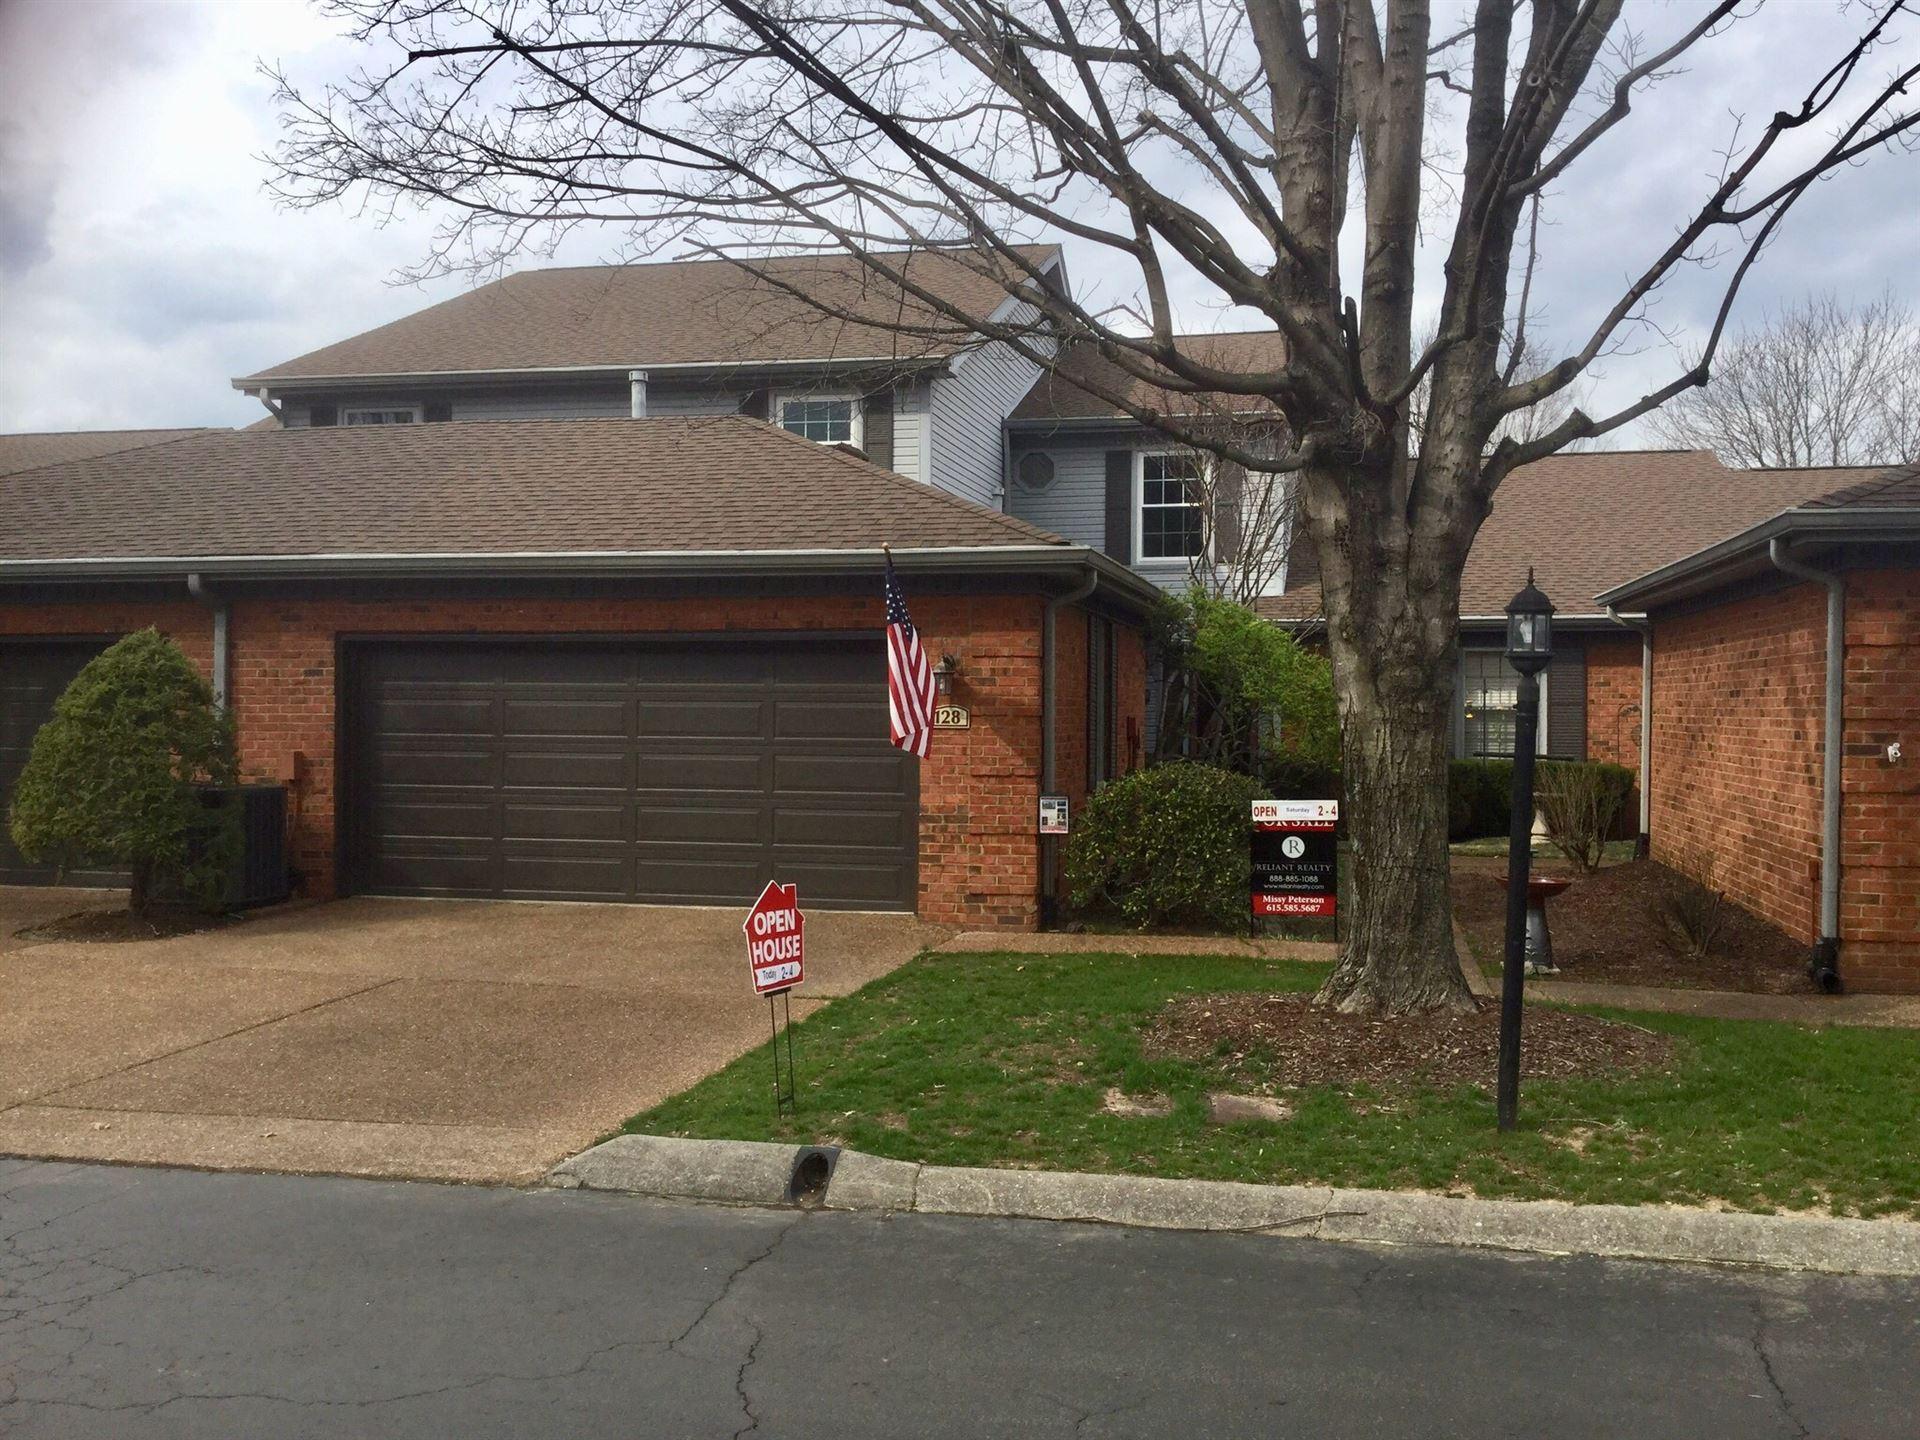 Photo of 128 Hearthstone Manor Cir #128, Brentwood, TN 37027 (MLS # 2168298)